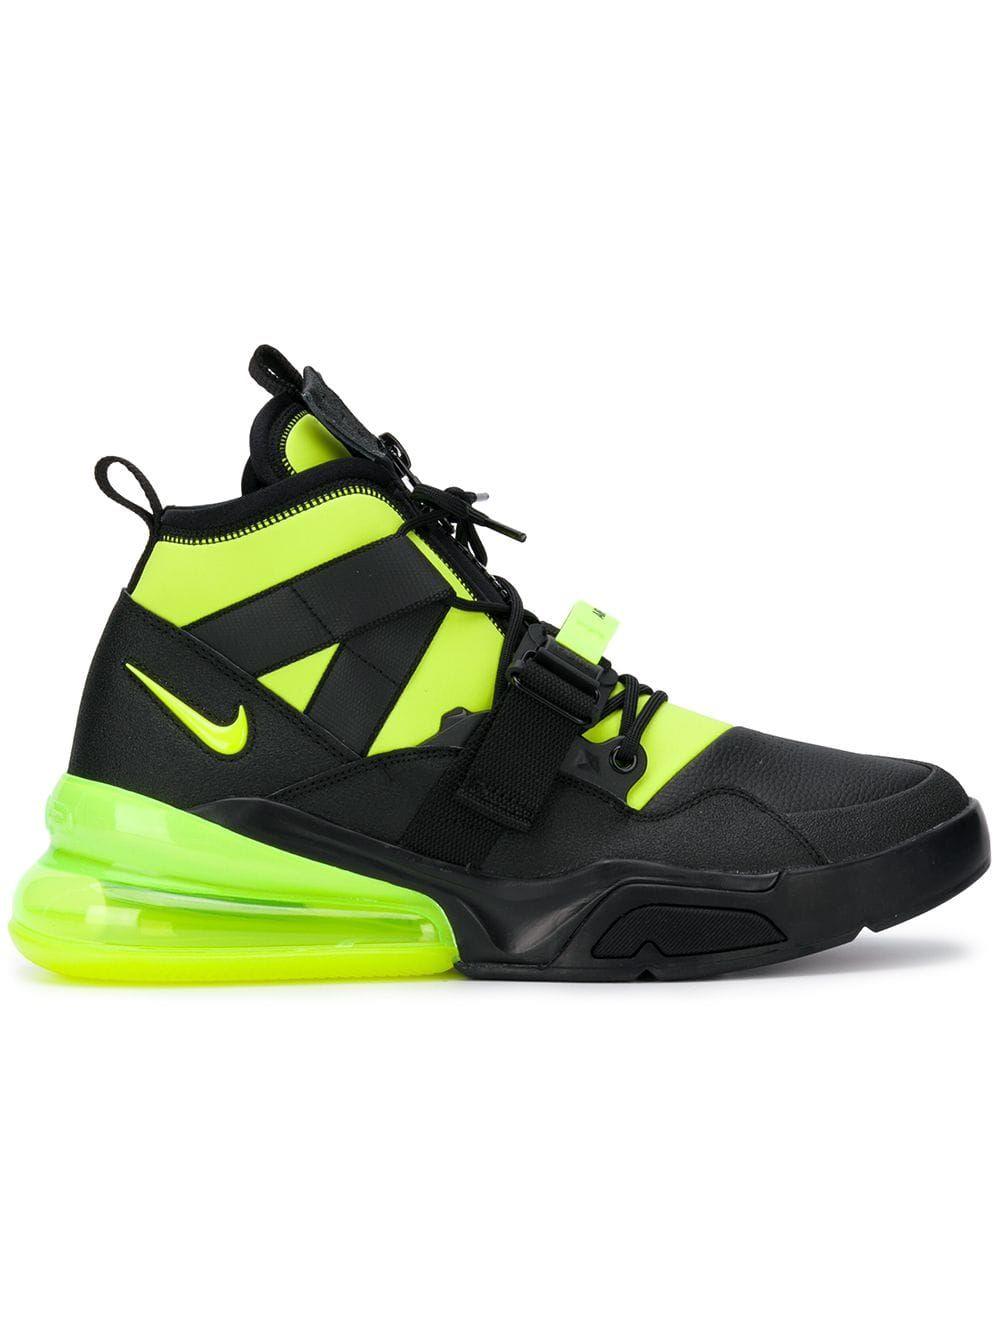 Nike Air Force 270 Utility sneakers Black | Nike air, Nike